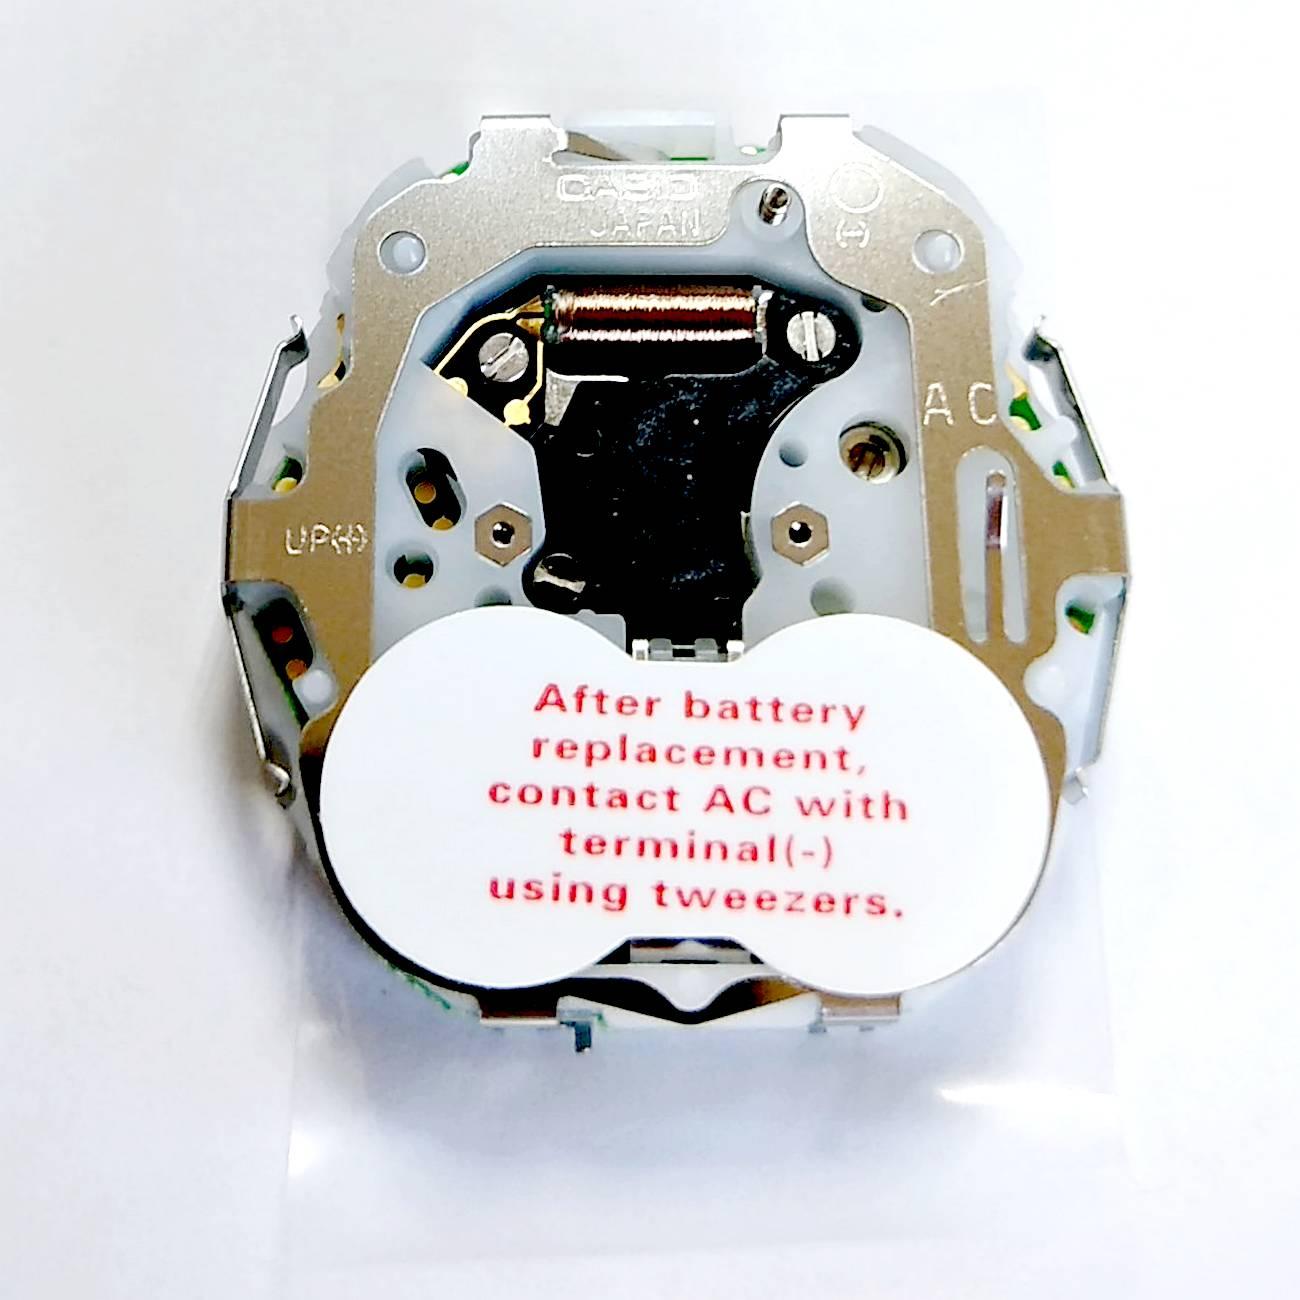 Módulo / Circuito Interno Casio G-shock G-501D  G-300BWC-1AV G-541D-1AV G-302-5A G-611LV-7A G-611LV-7AV   - E-Presentes